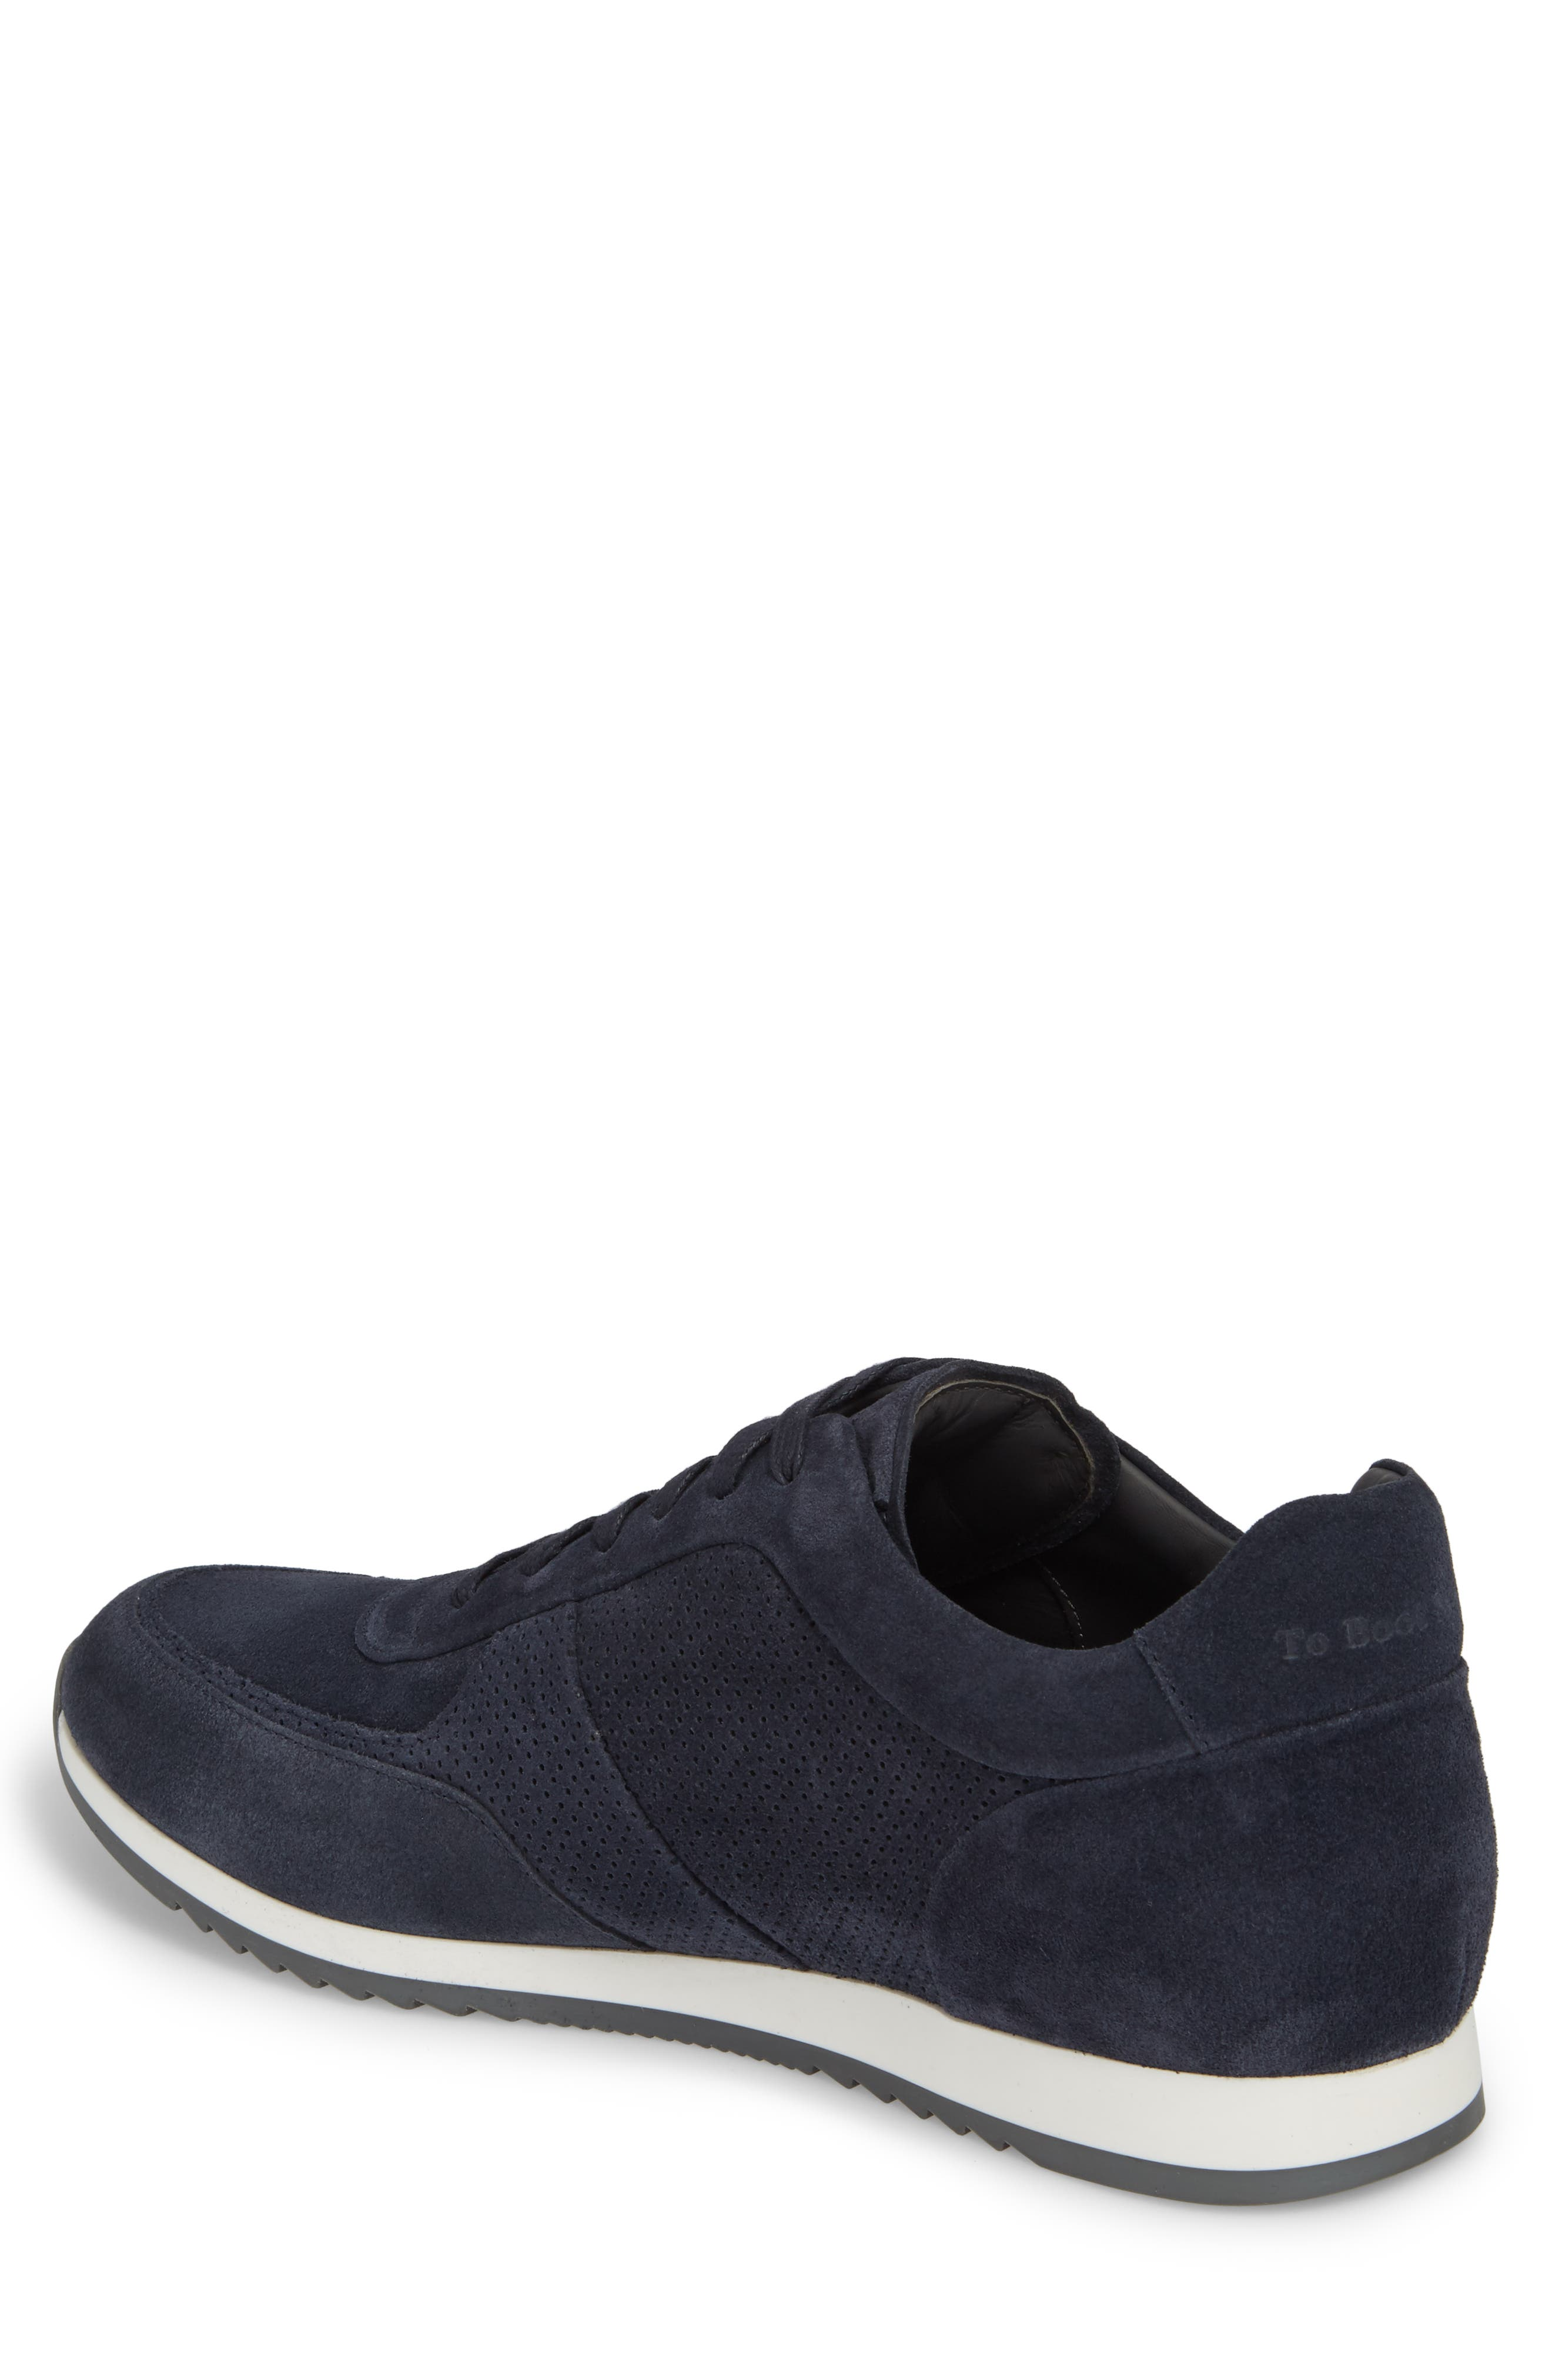 Fordham Low Top Sneaker,                             Alternate thumbnail 2, color,                             Space Blue Suede